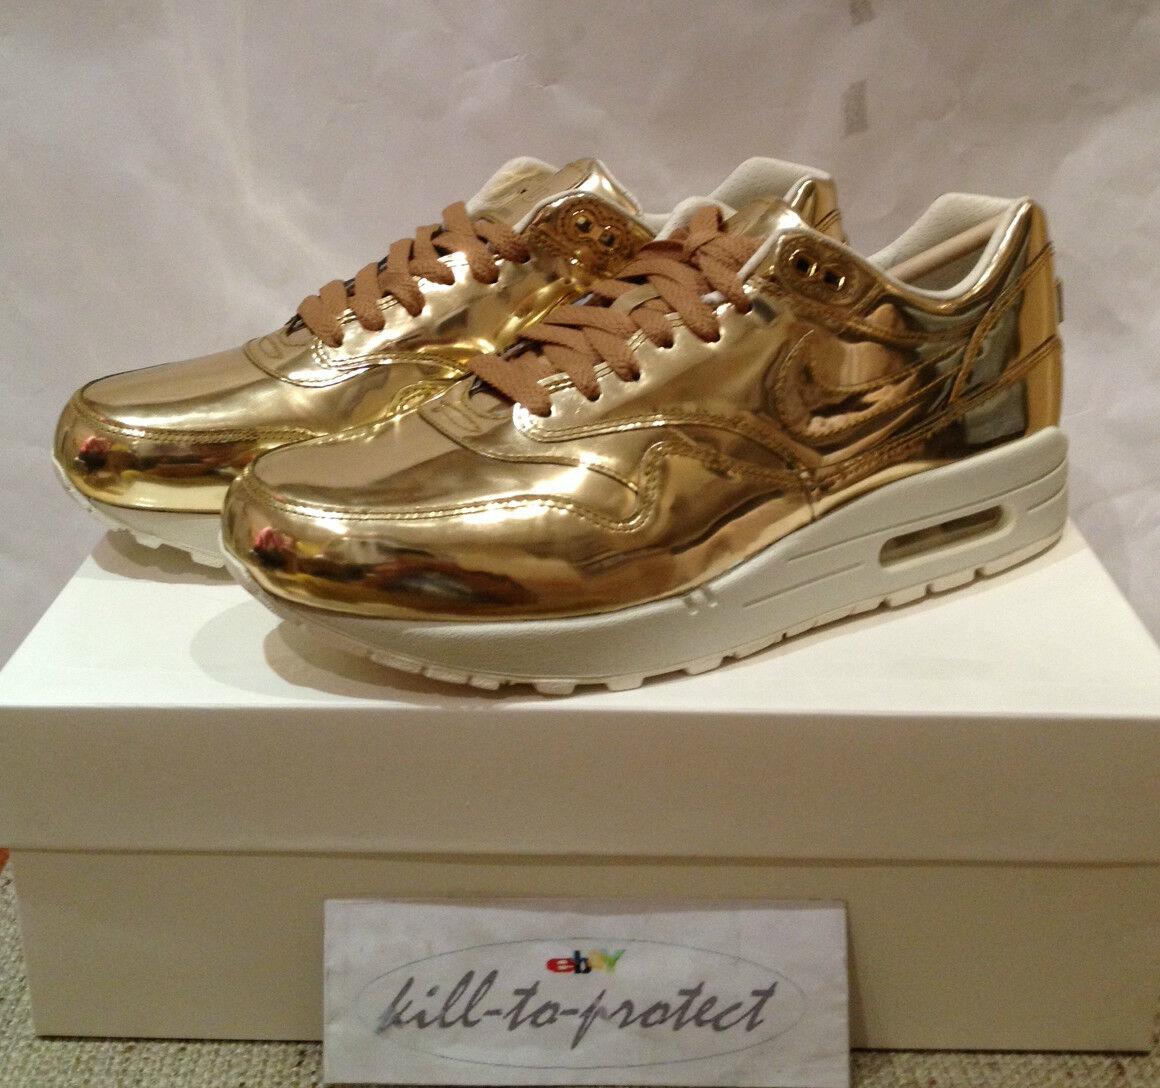 NIKE WMNS AIR MAX 1 LIQUID METAL GOLD US UK5 6 7 8 9 10 11 TZ 616170-700 SP 2013 Cheap and beautiful fashion